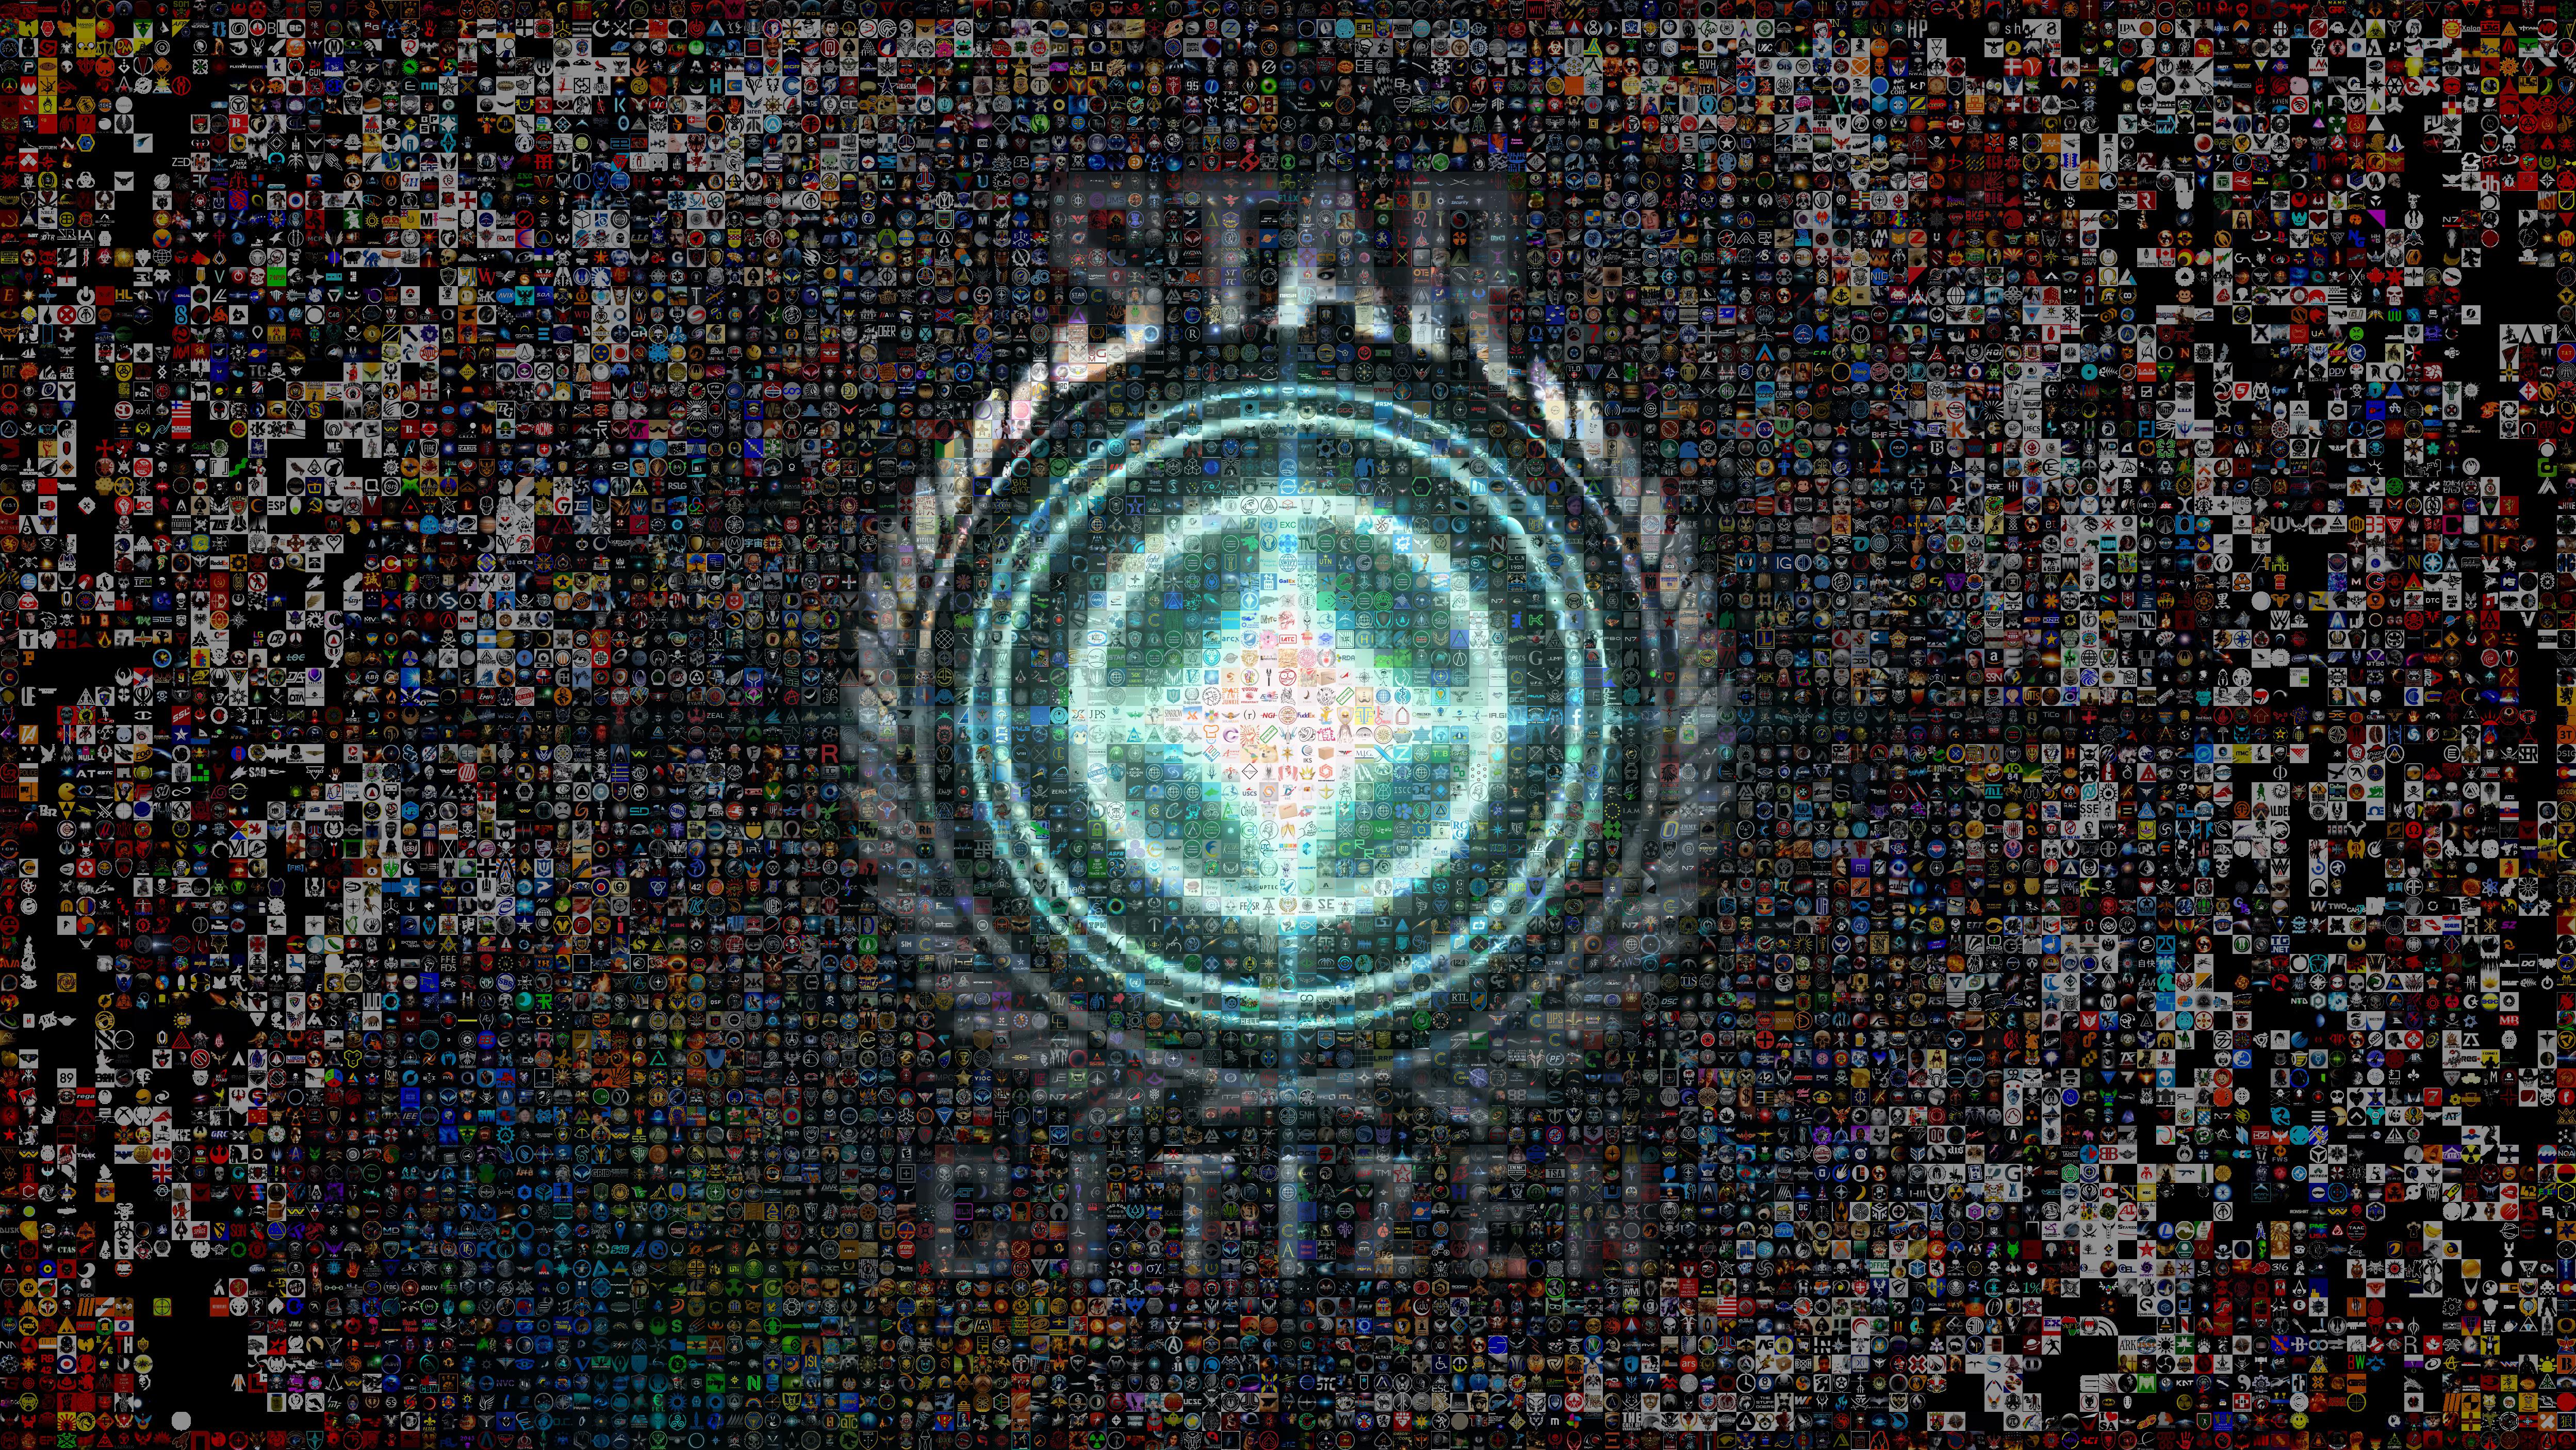 SC-Mosaic.png